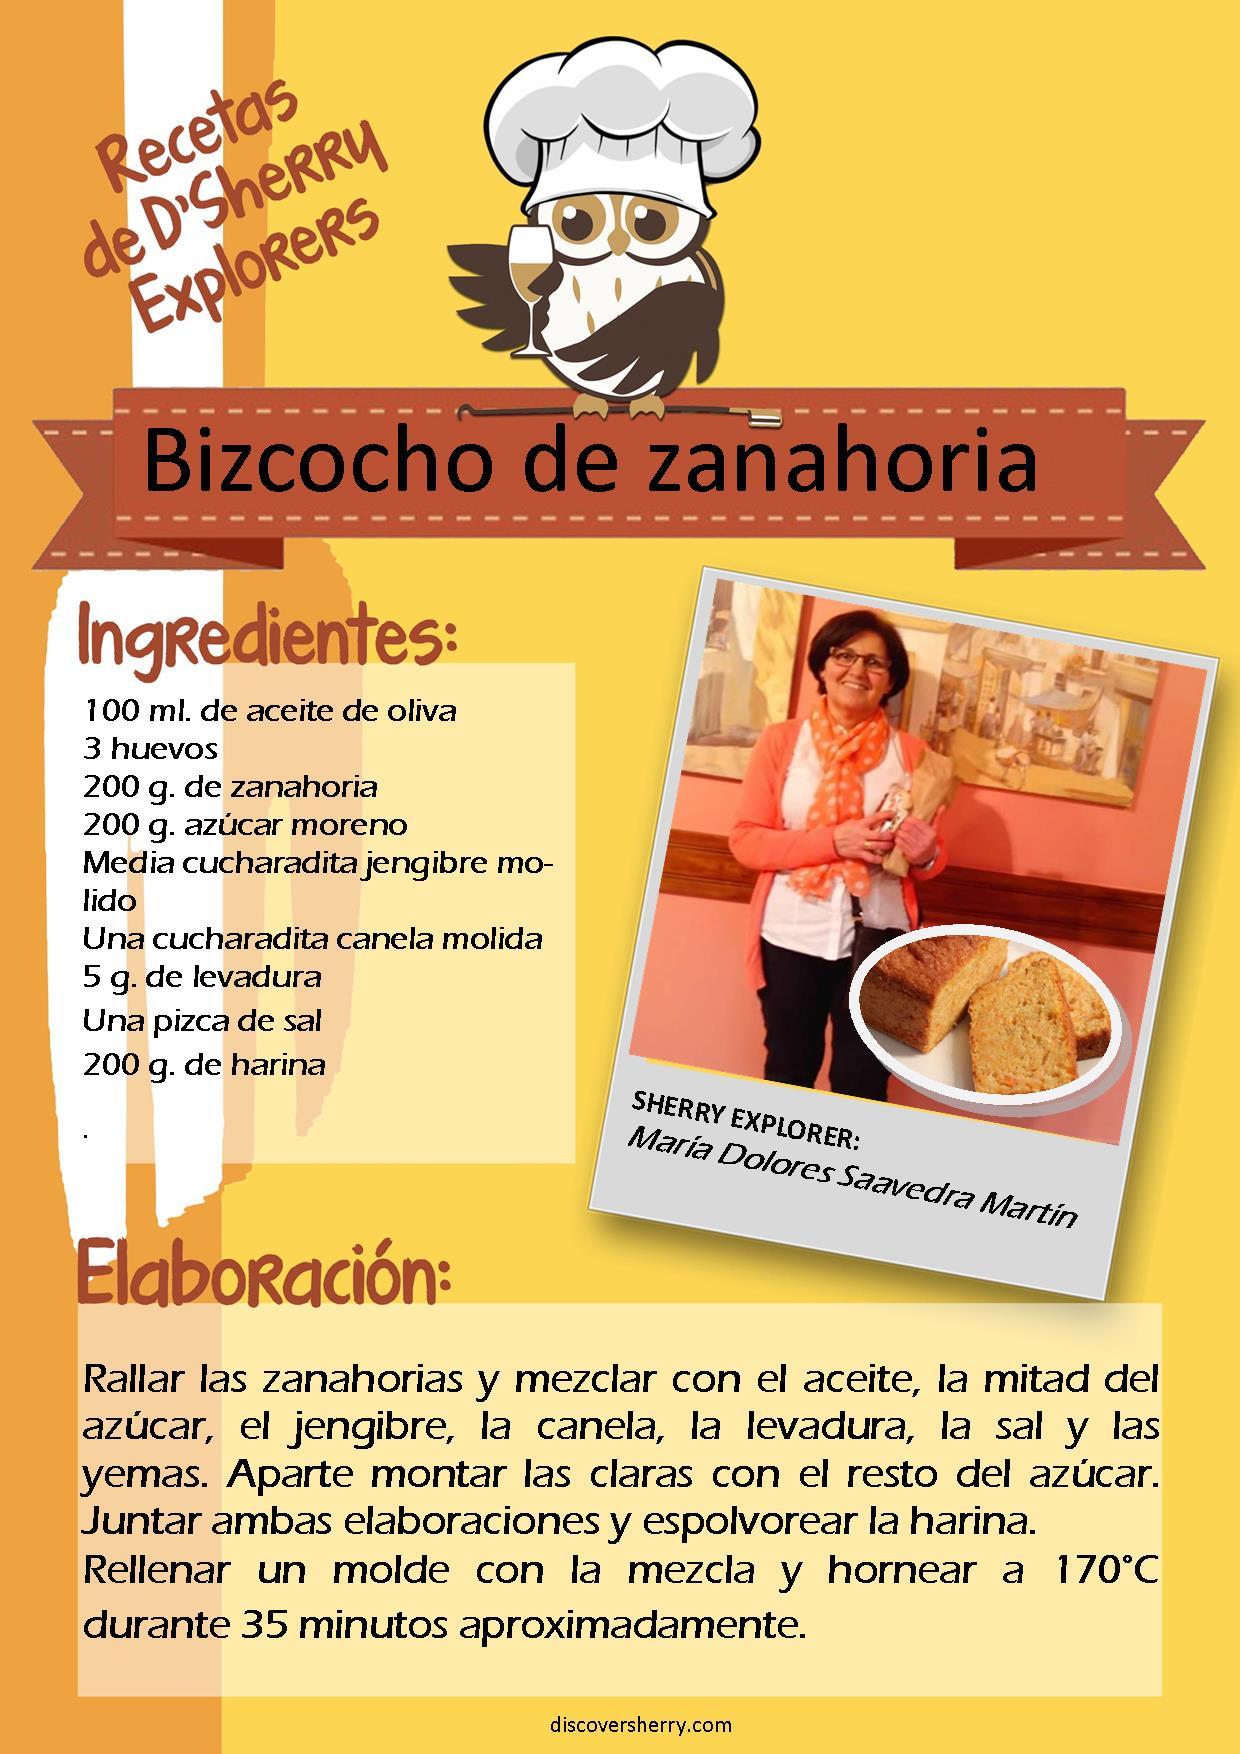 Receta D´Sherry Explorers: Bizcocho dezanahoria.